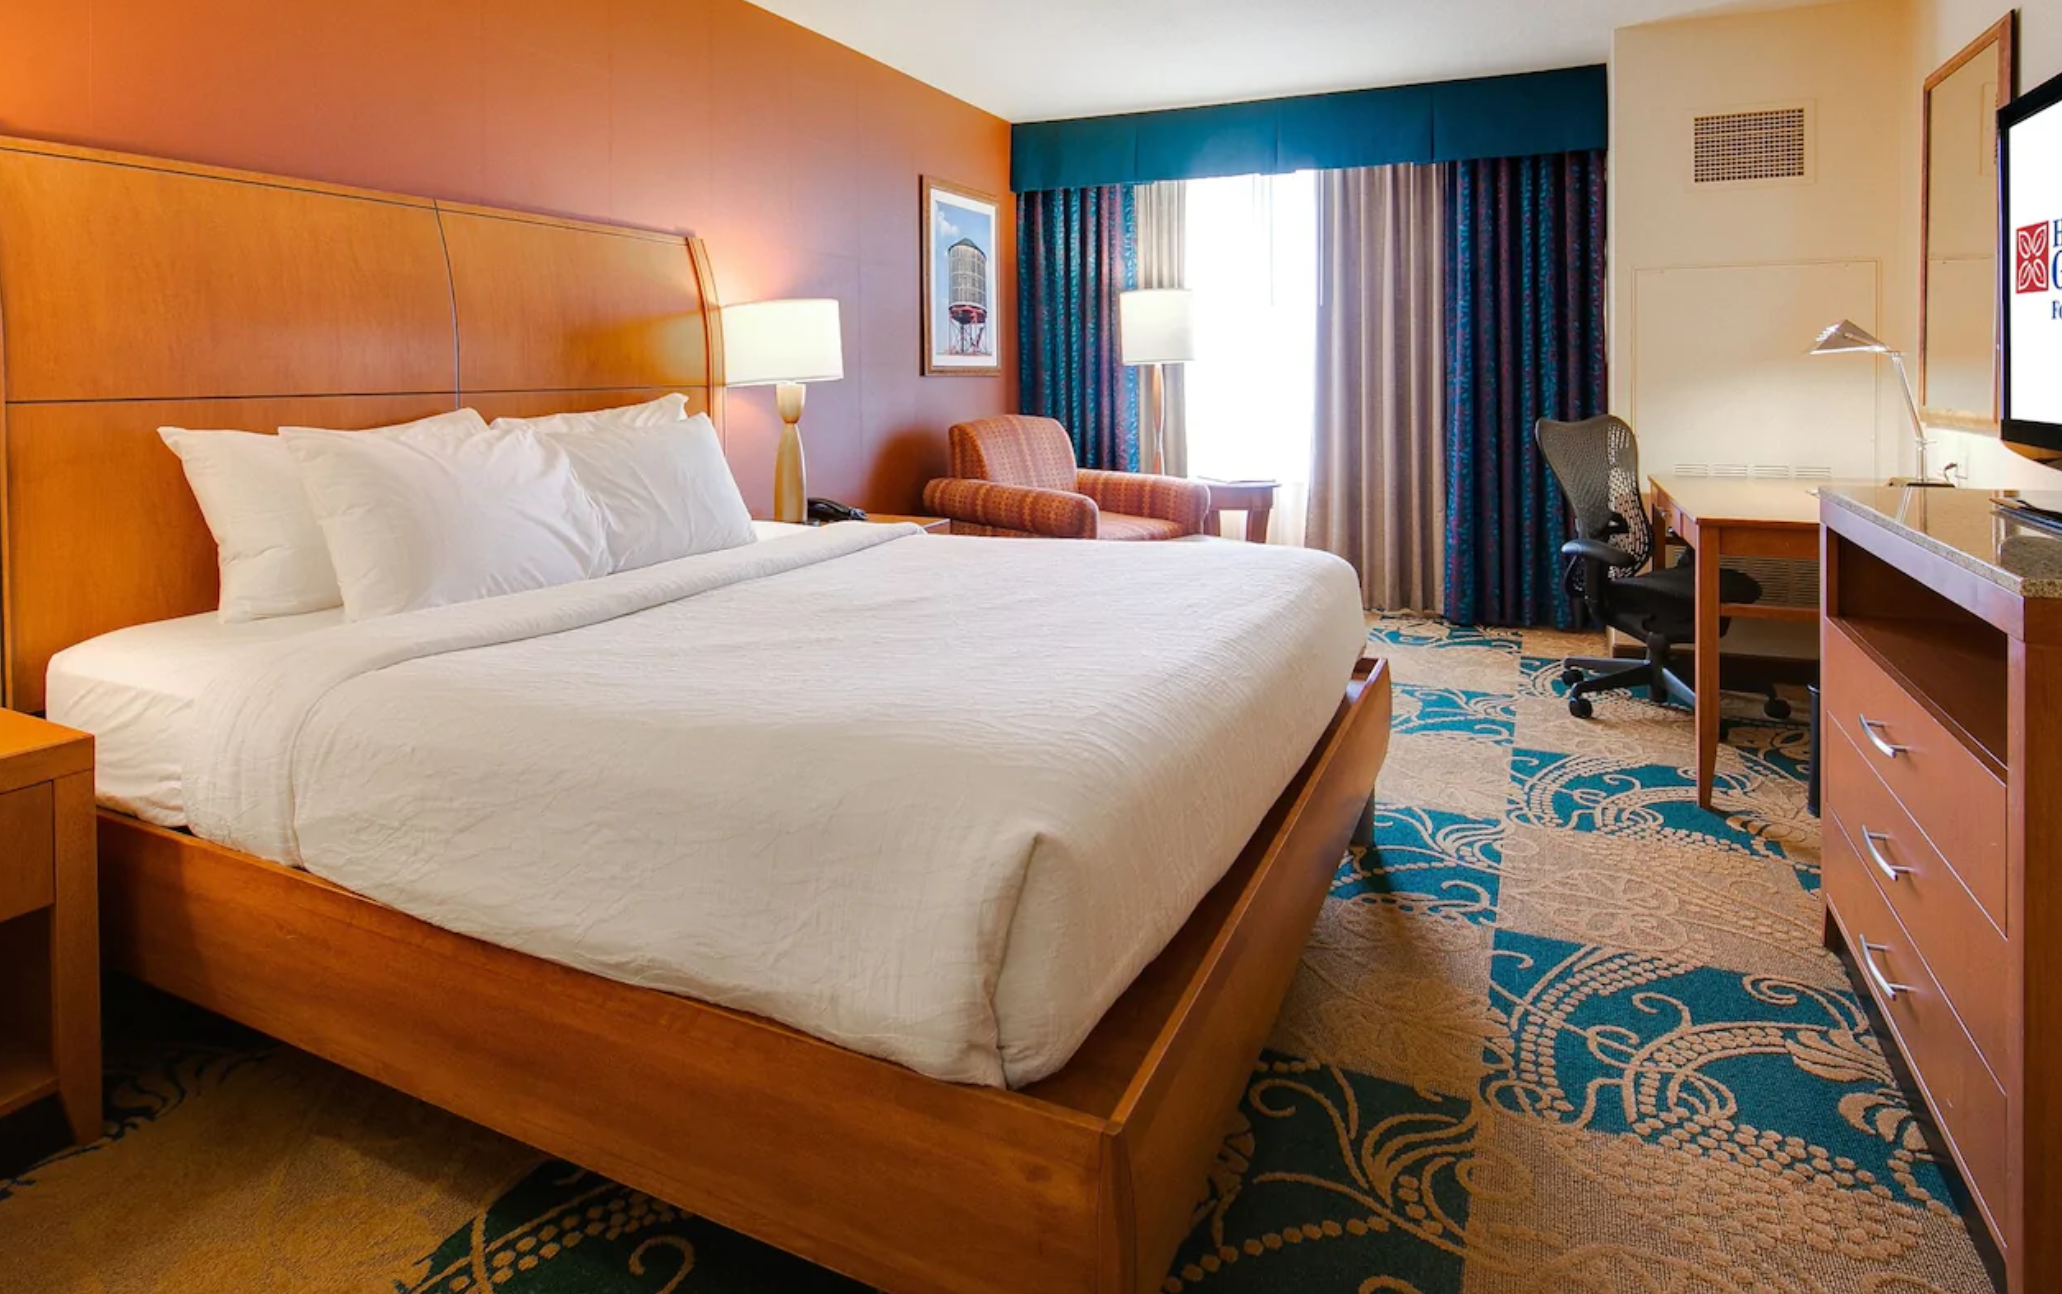 https://www.hotelsbyday.com/_data/default-hotel_image/4/23327/screenshot-2020-10-30-at-5-01-18-pm.png